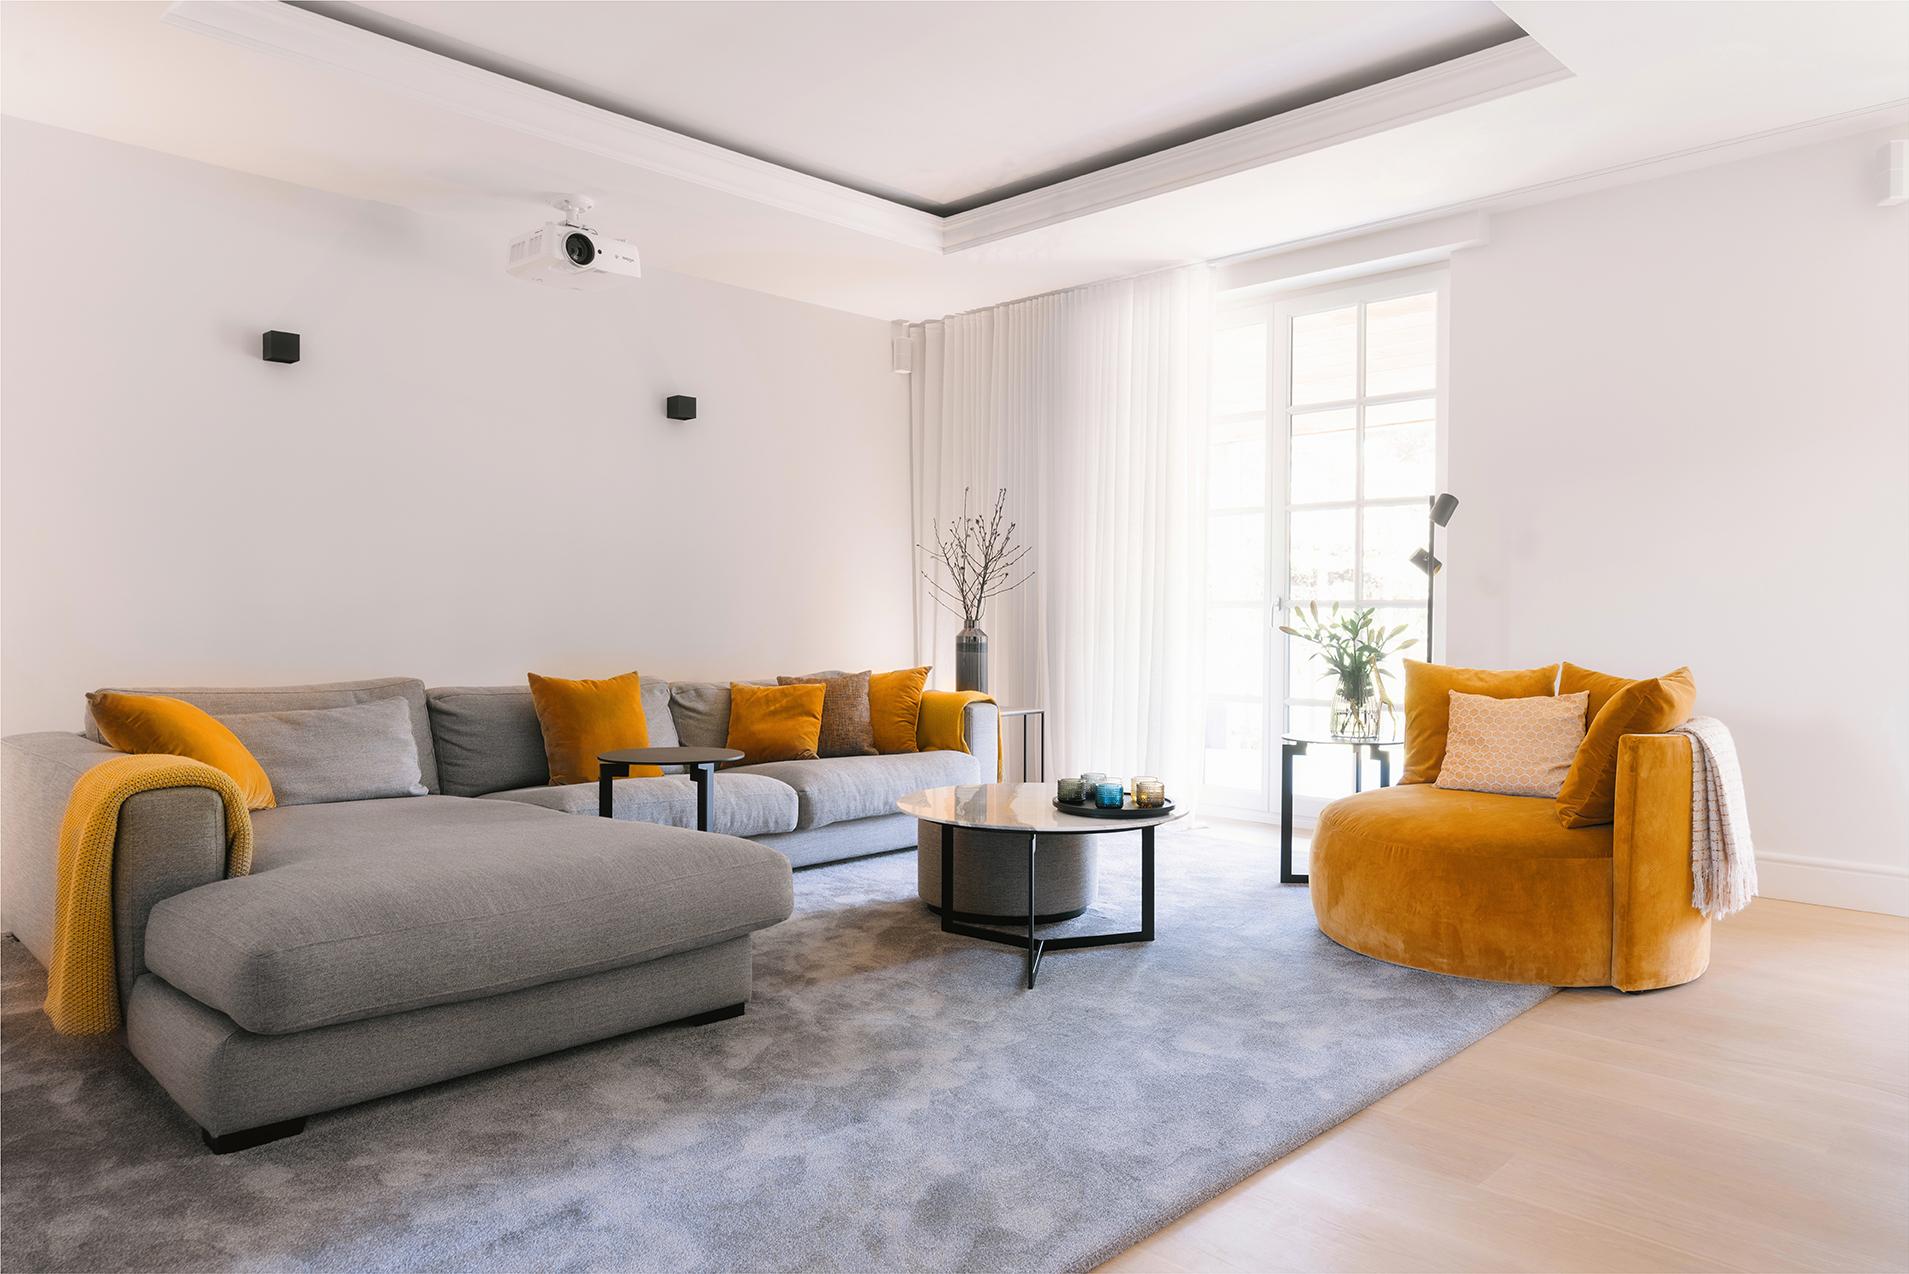 Inrichting villa Oud-Turnhout (5)